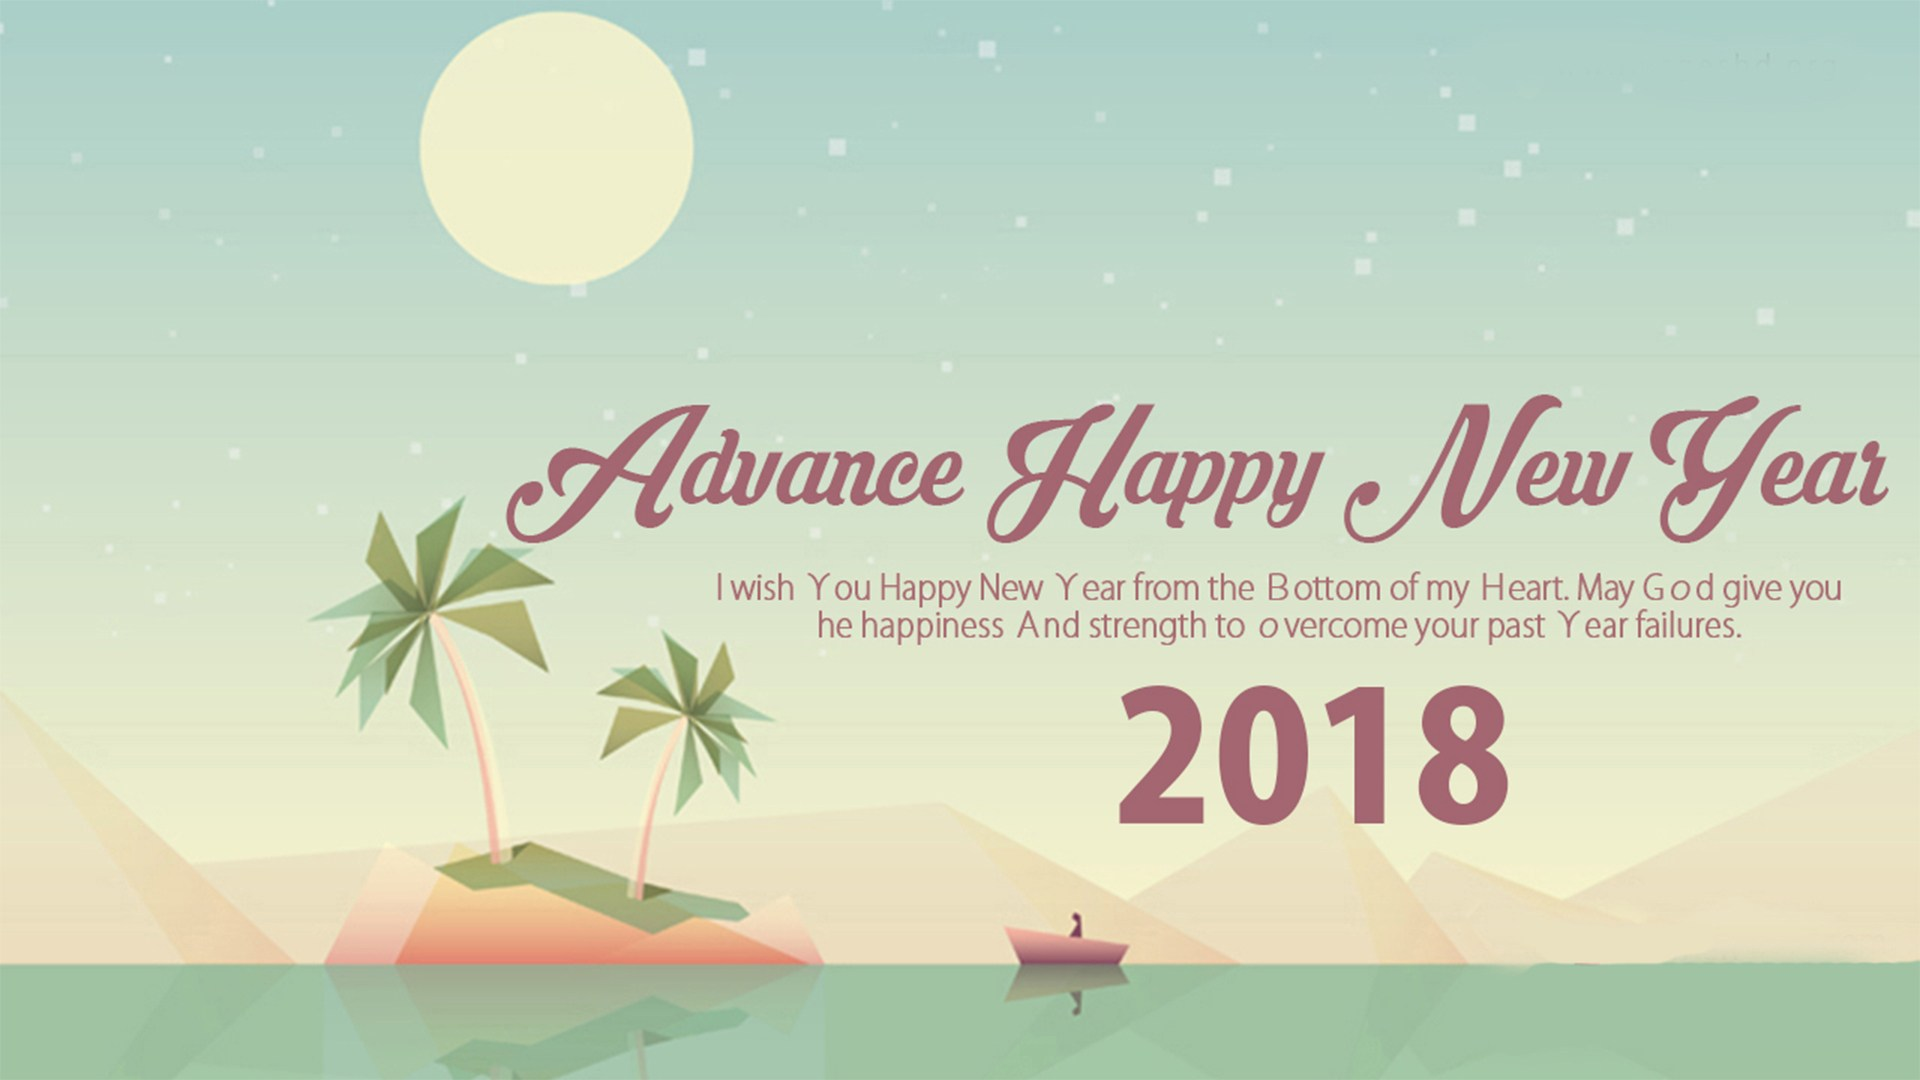 Advance Happy New Year Image - Wish You Happy New Year 2018 - HD Wallpaper